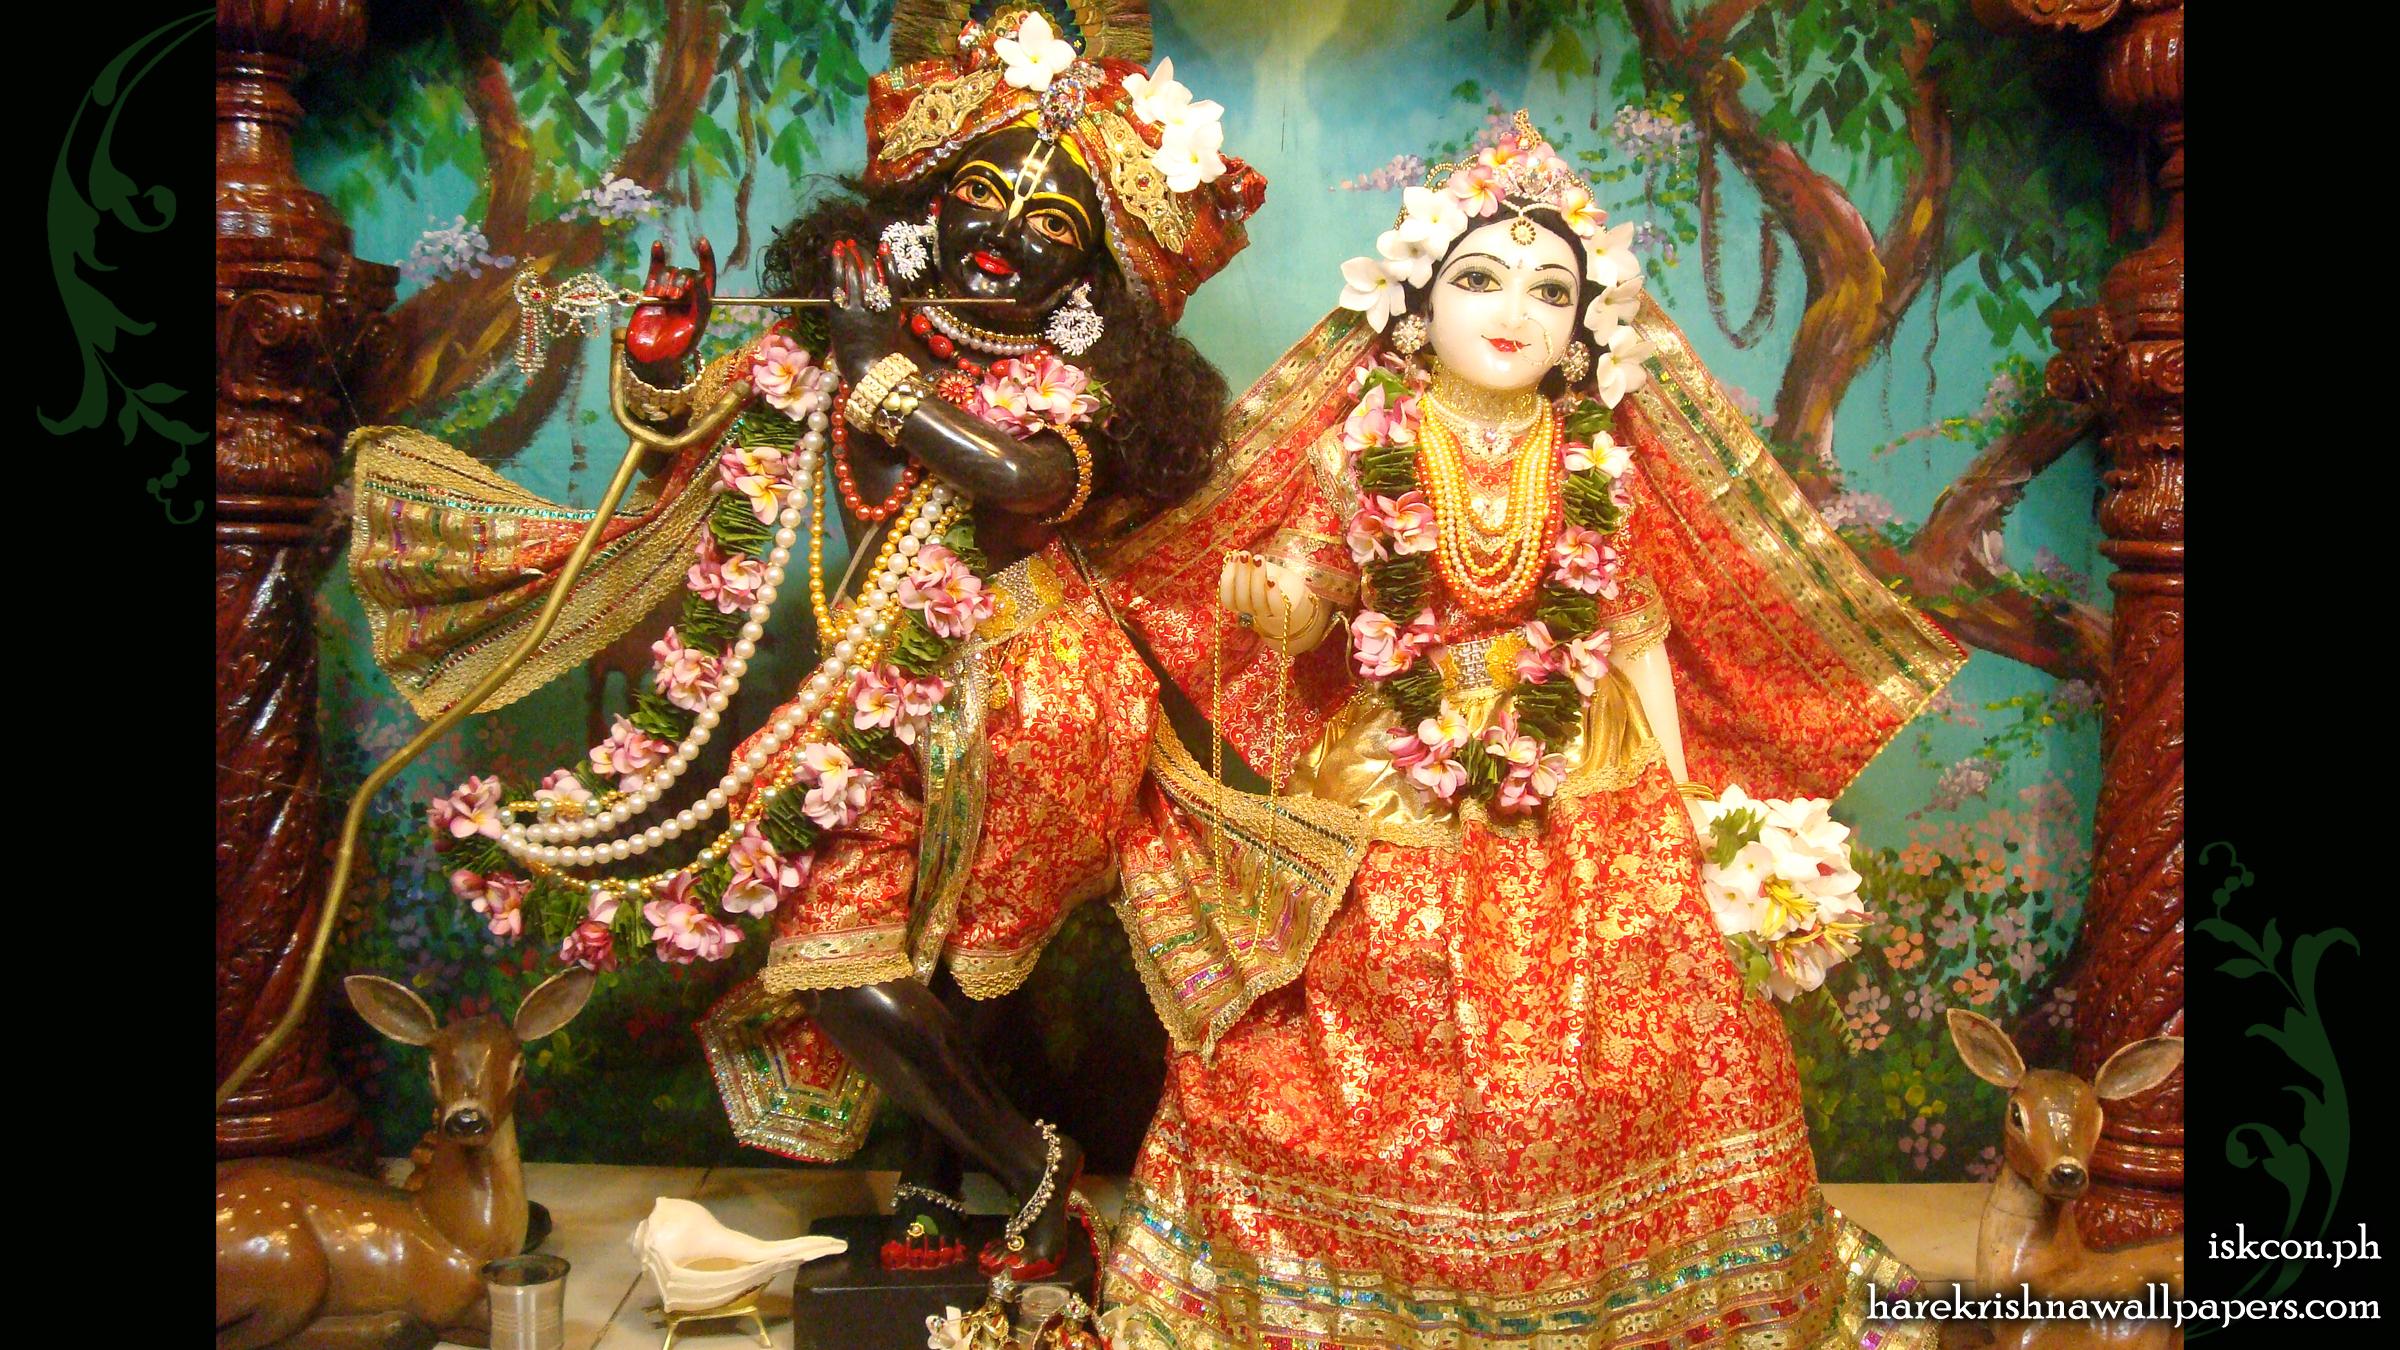 Sri Sri Radha Madhava Wallpaper (012) Size 2400x1350 Download